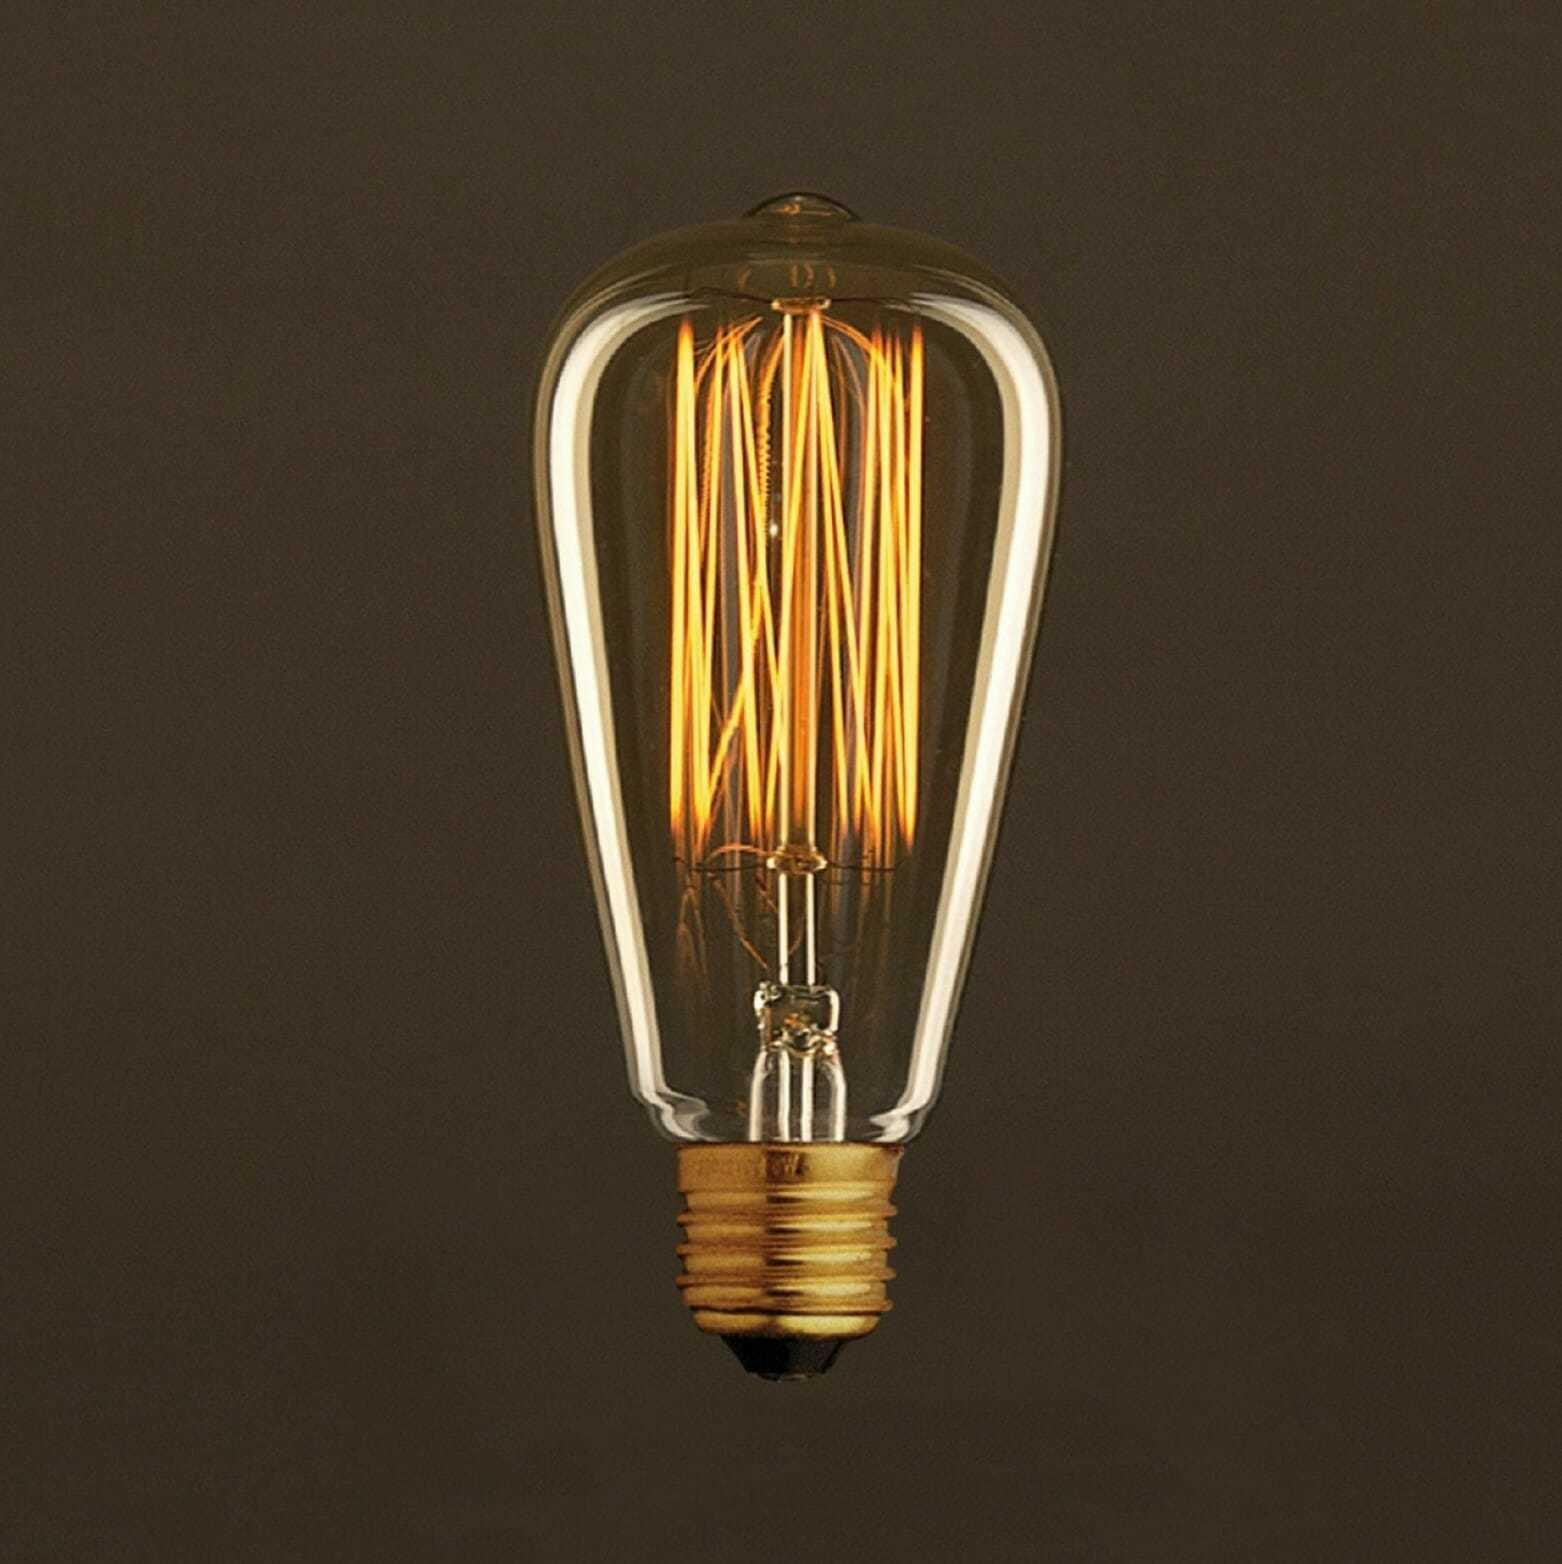 Lampade A Led A Filamento.Lampadina Filamento Carbon Disegno Onda Edison 6 4 Cm